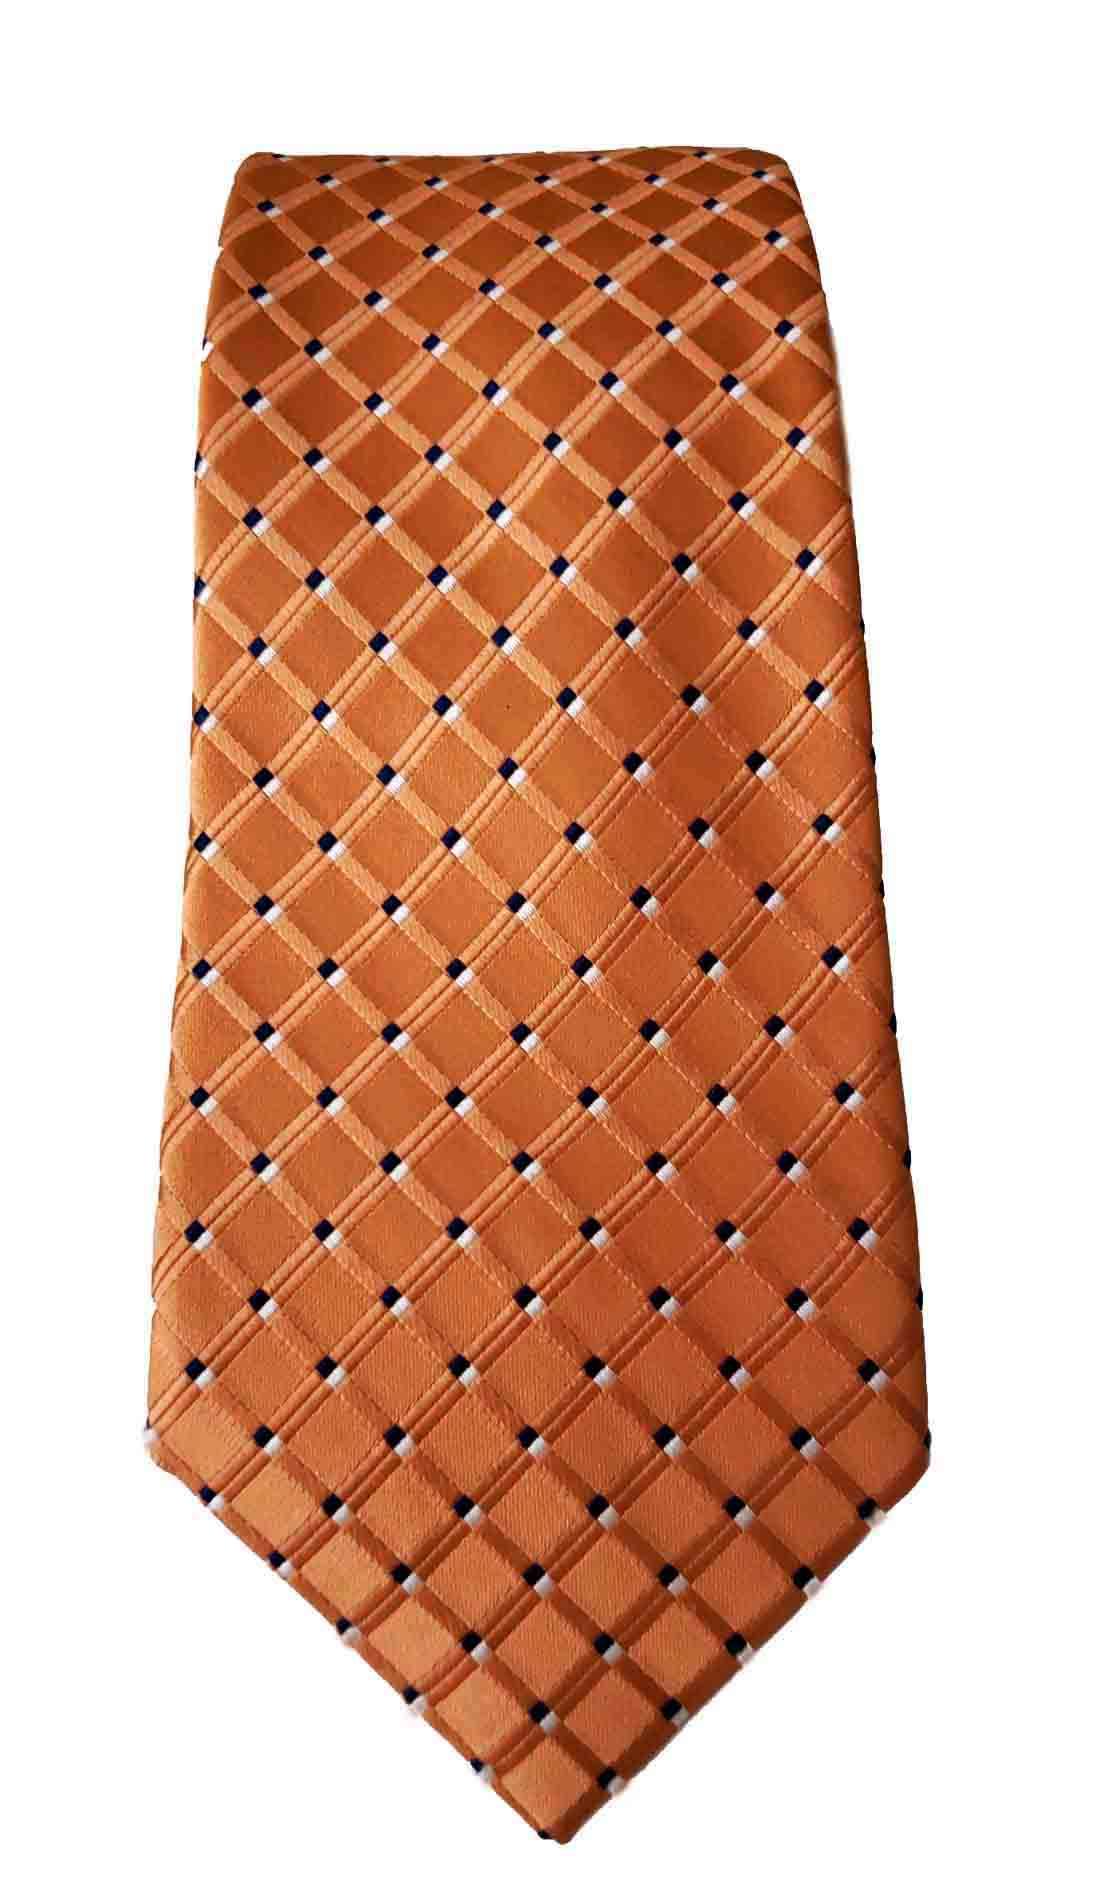 Club Room Silk Tie Orange Blue White Lattice Check Silk Men's